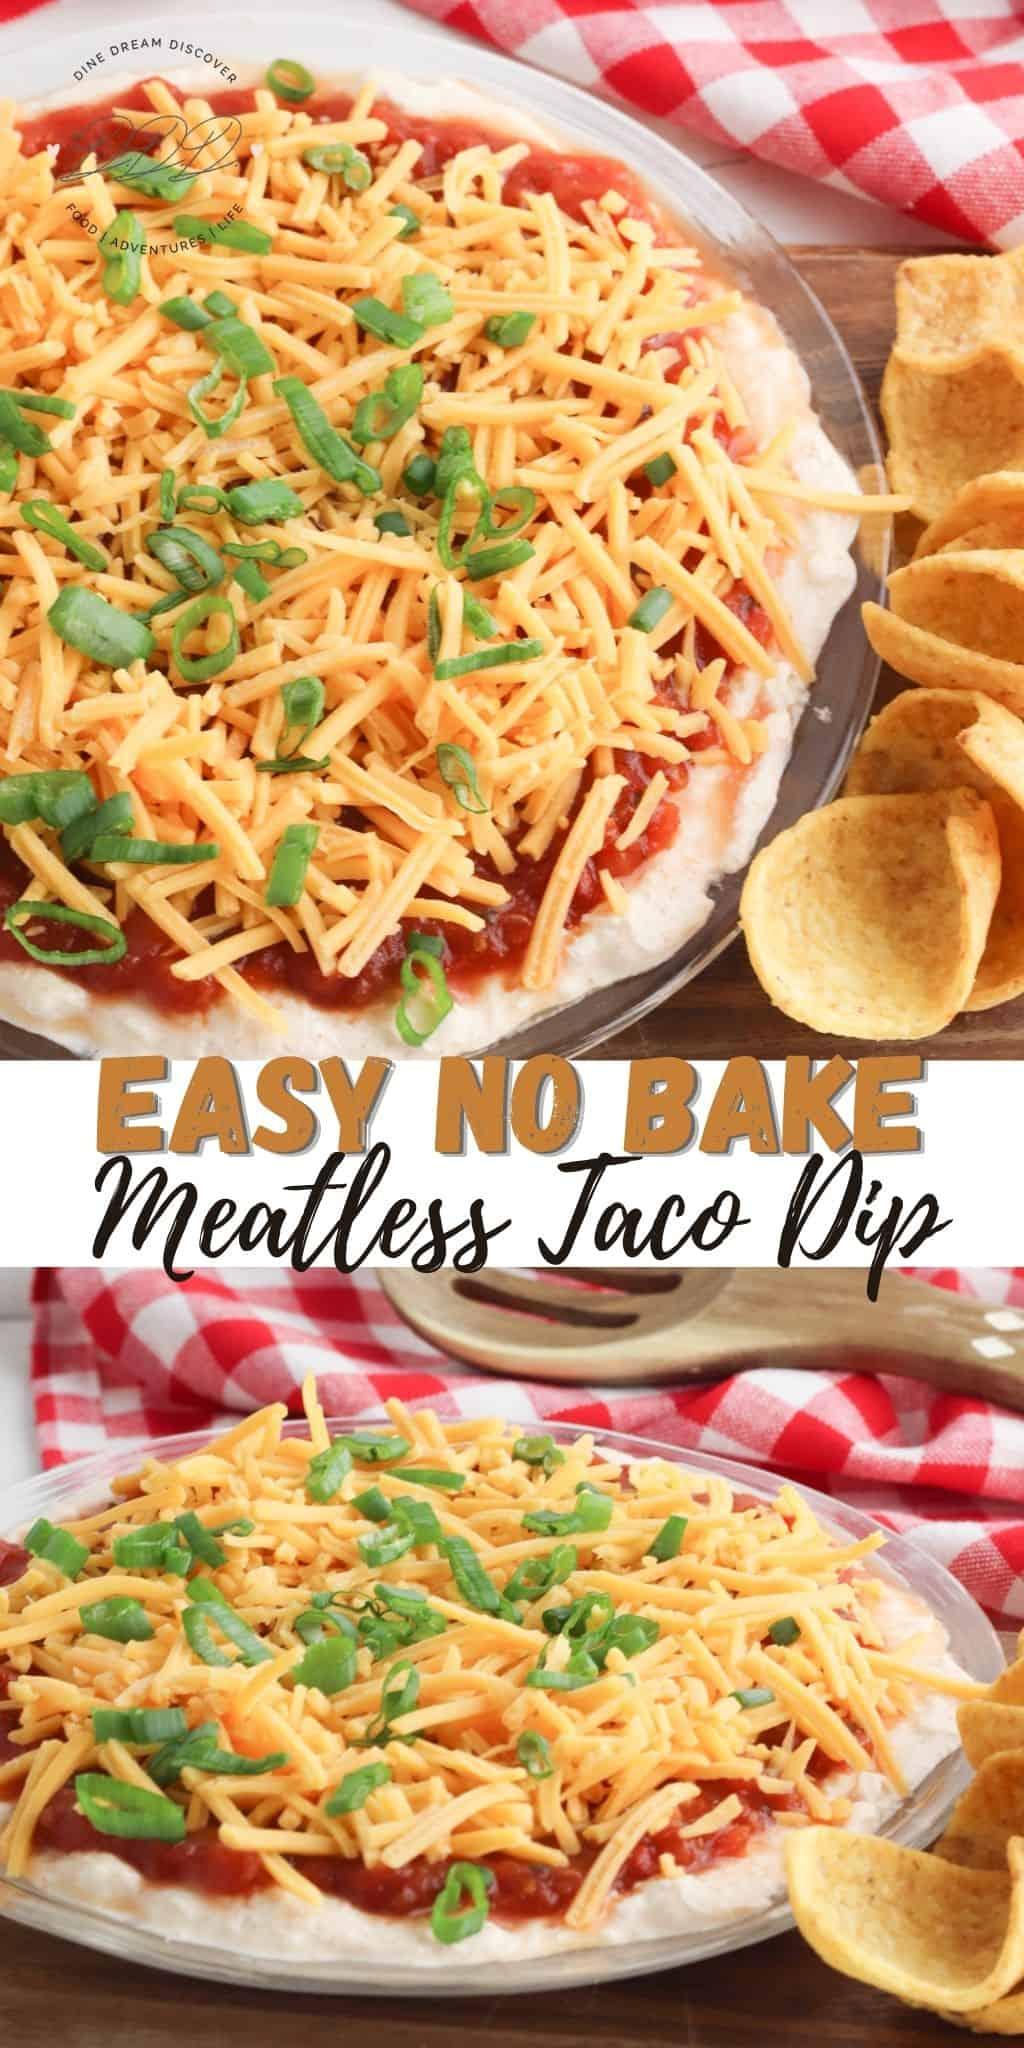 Easy No Bake Meatless Taco Dip Recipe